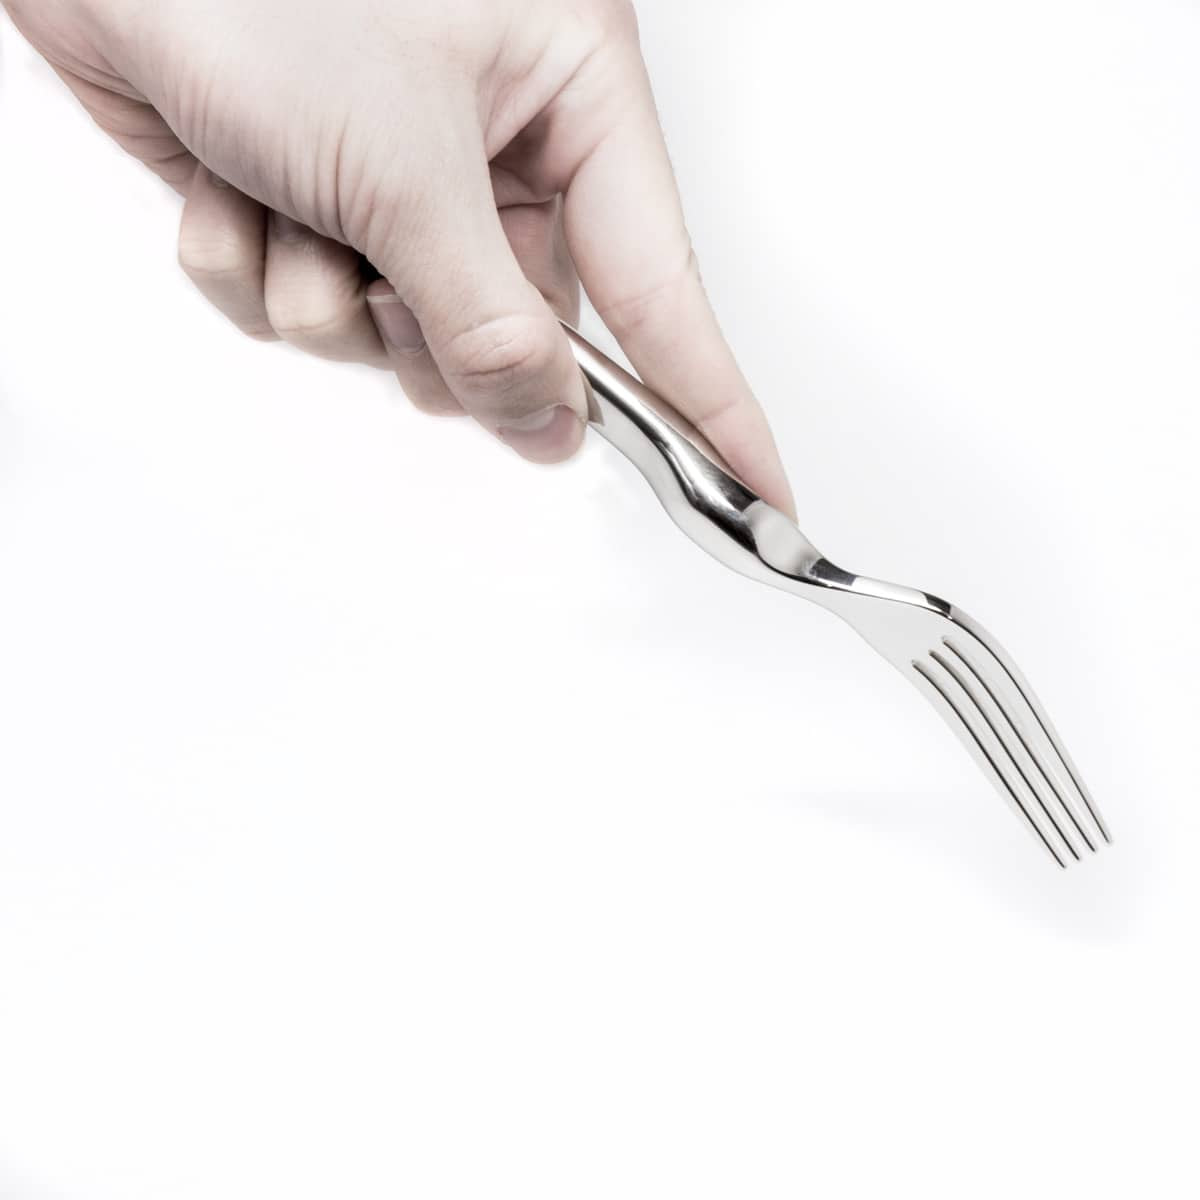 3D Print Design Cutlery